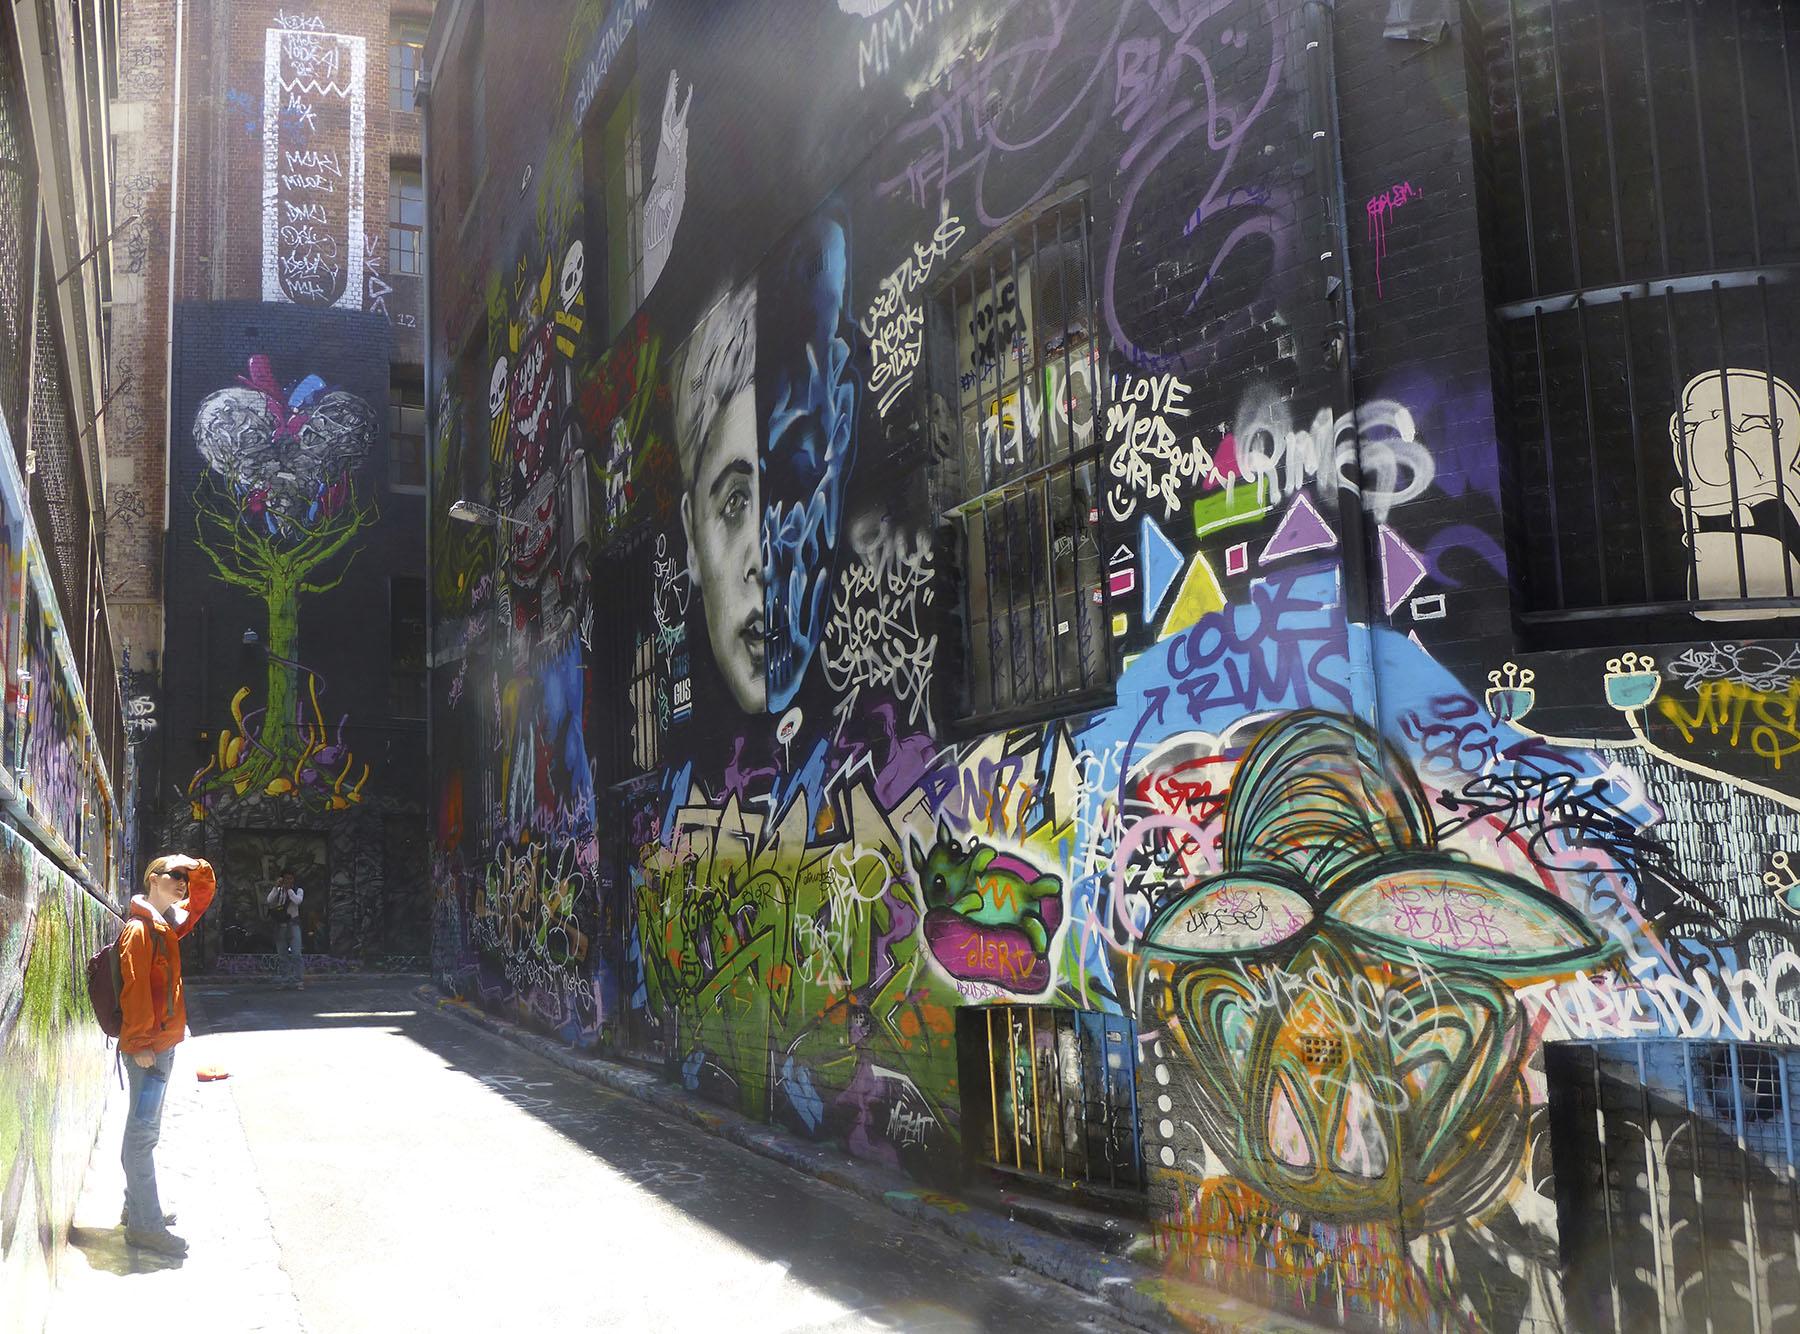 It's Not Vandalism, It's Art